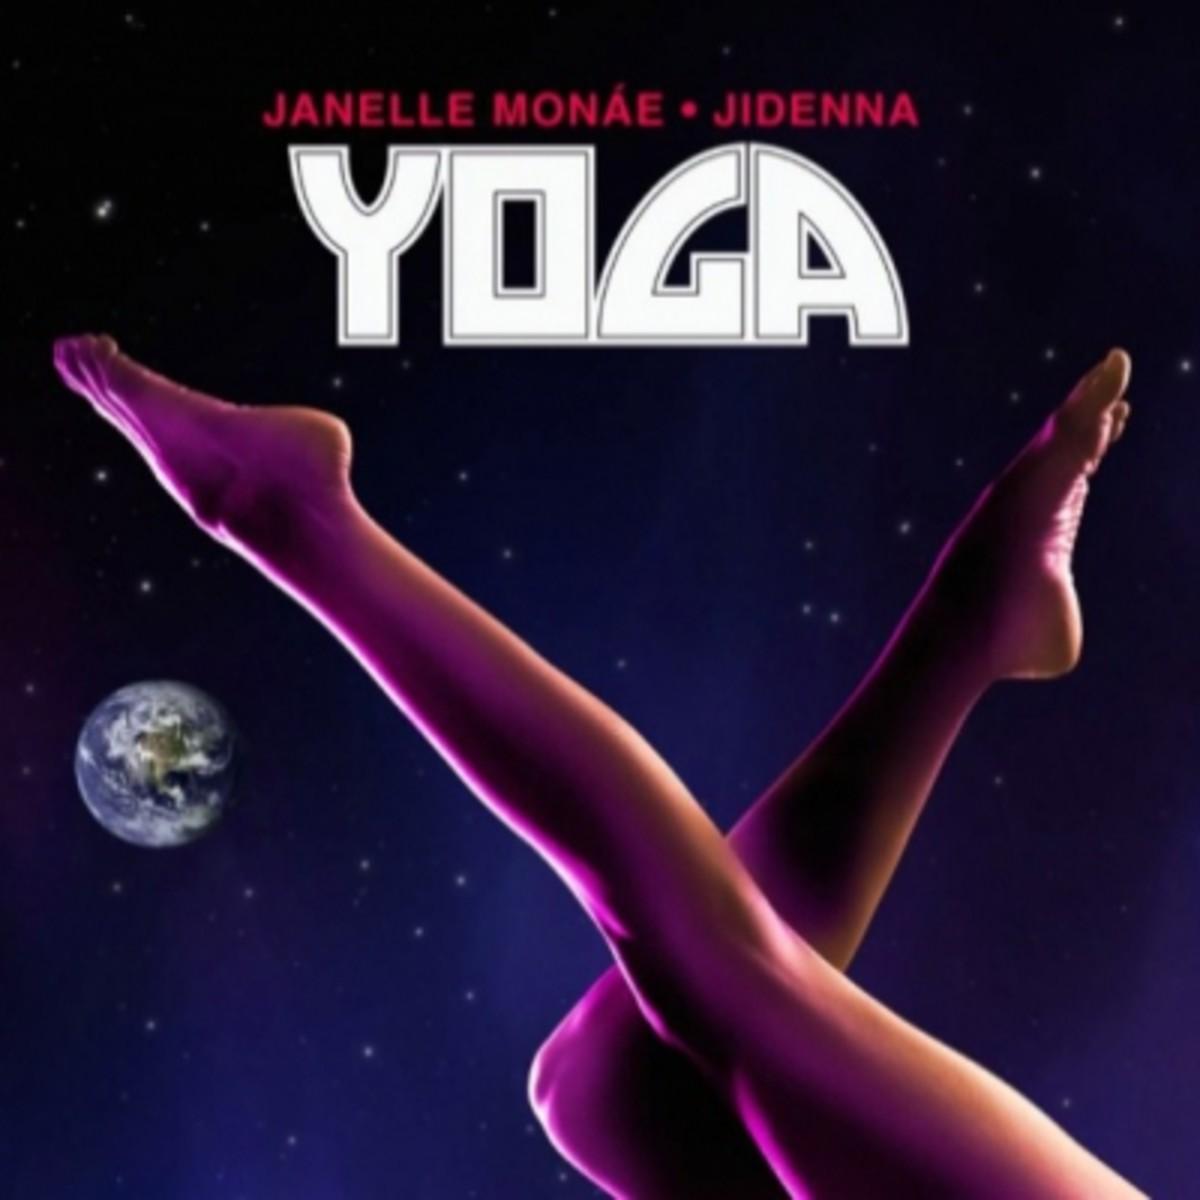 janelle-monae-jidenna-yoga.jpg